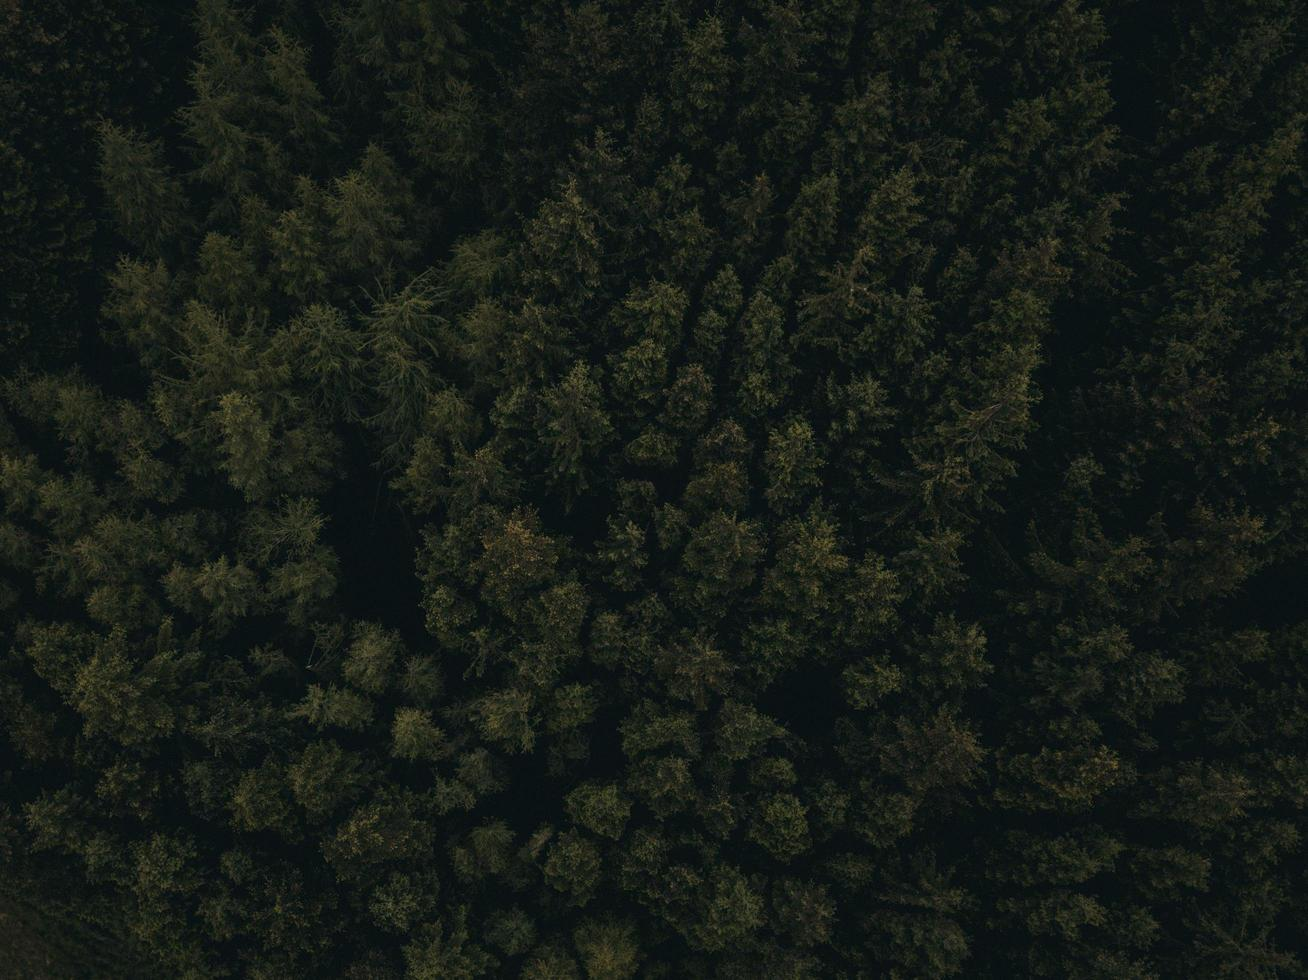 fotografia aérea de árvores verdes foto